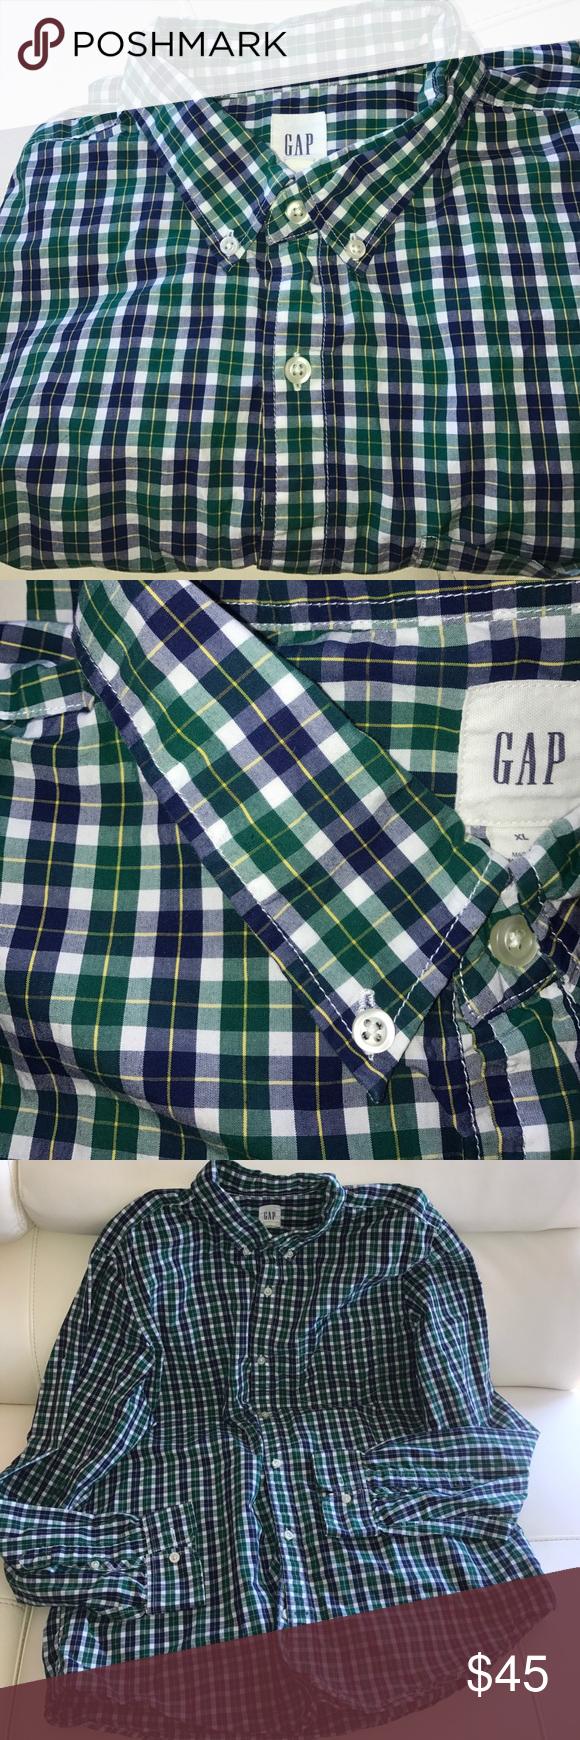 GAP MEN'S GREEN PLAID BUTTON DOWN DRESS SHIRT GAP MEN'S GREEN PLAID BUTTON DOWN DRESS SHIRT . SIZE : XL ( XTRA LARGE) - LIKE NEW CONDITION. 1 pocket front . 100% Cotton GAP Shirts Dress Shirts